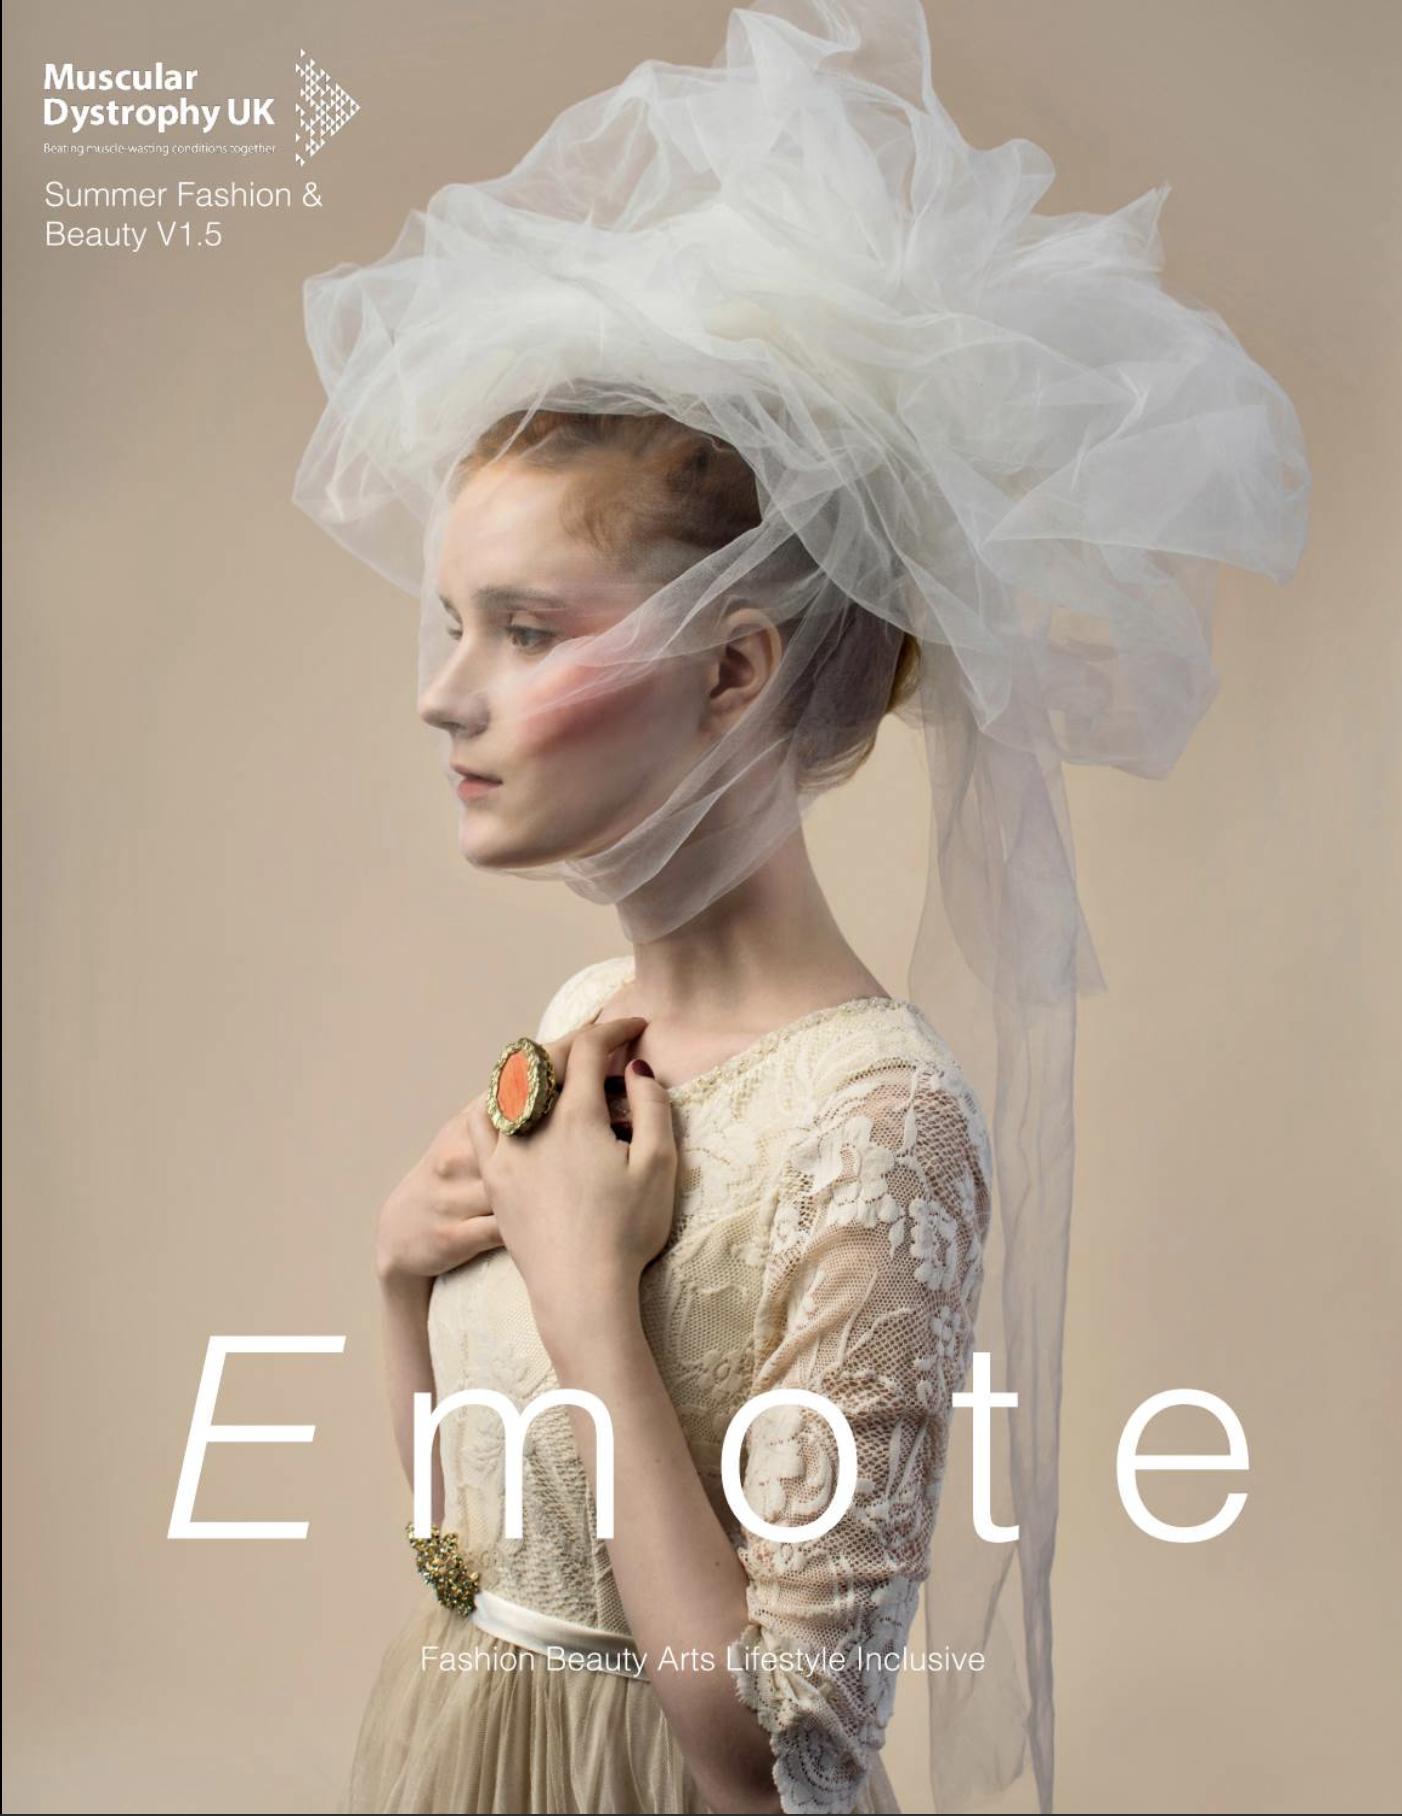 - editorial for Emote MagPhotography/stylist: Sylwia Gniazdowskamodel Wiktoria Chroma